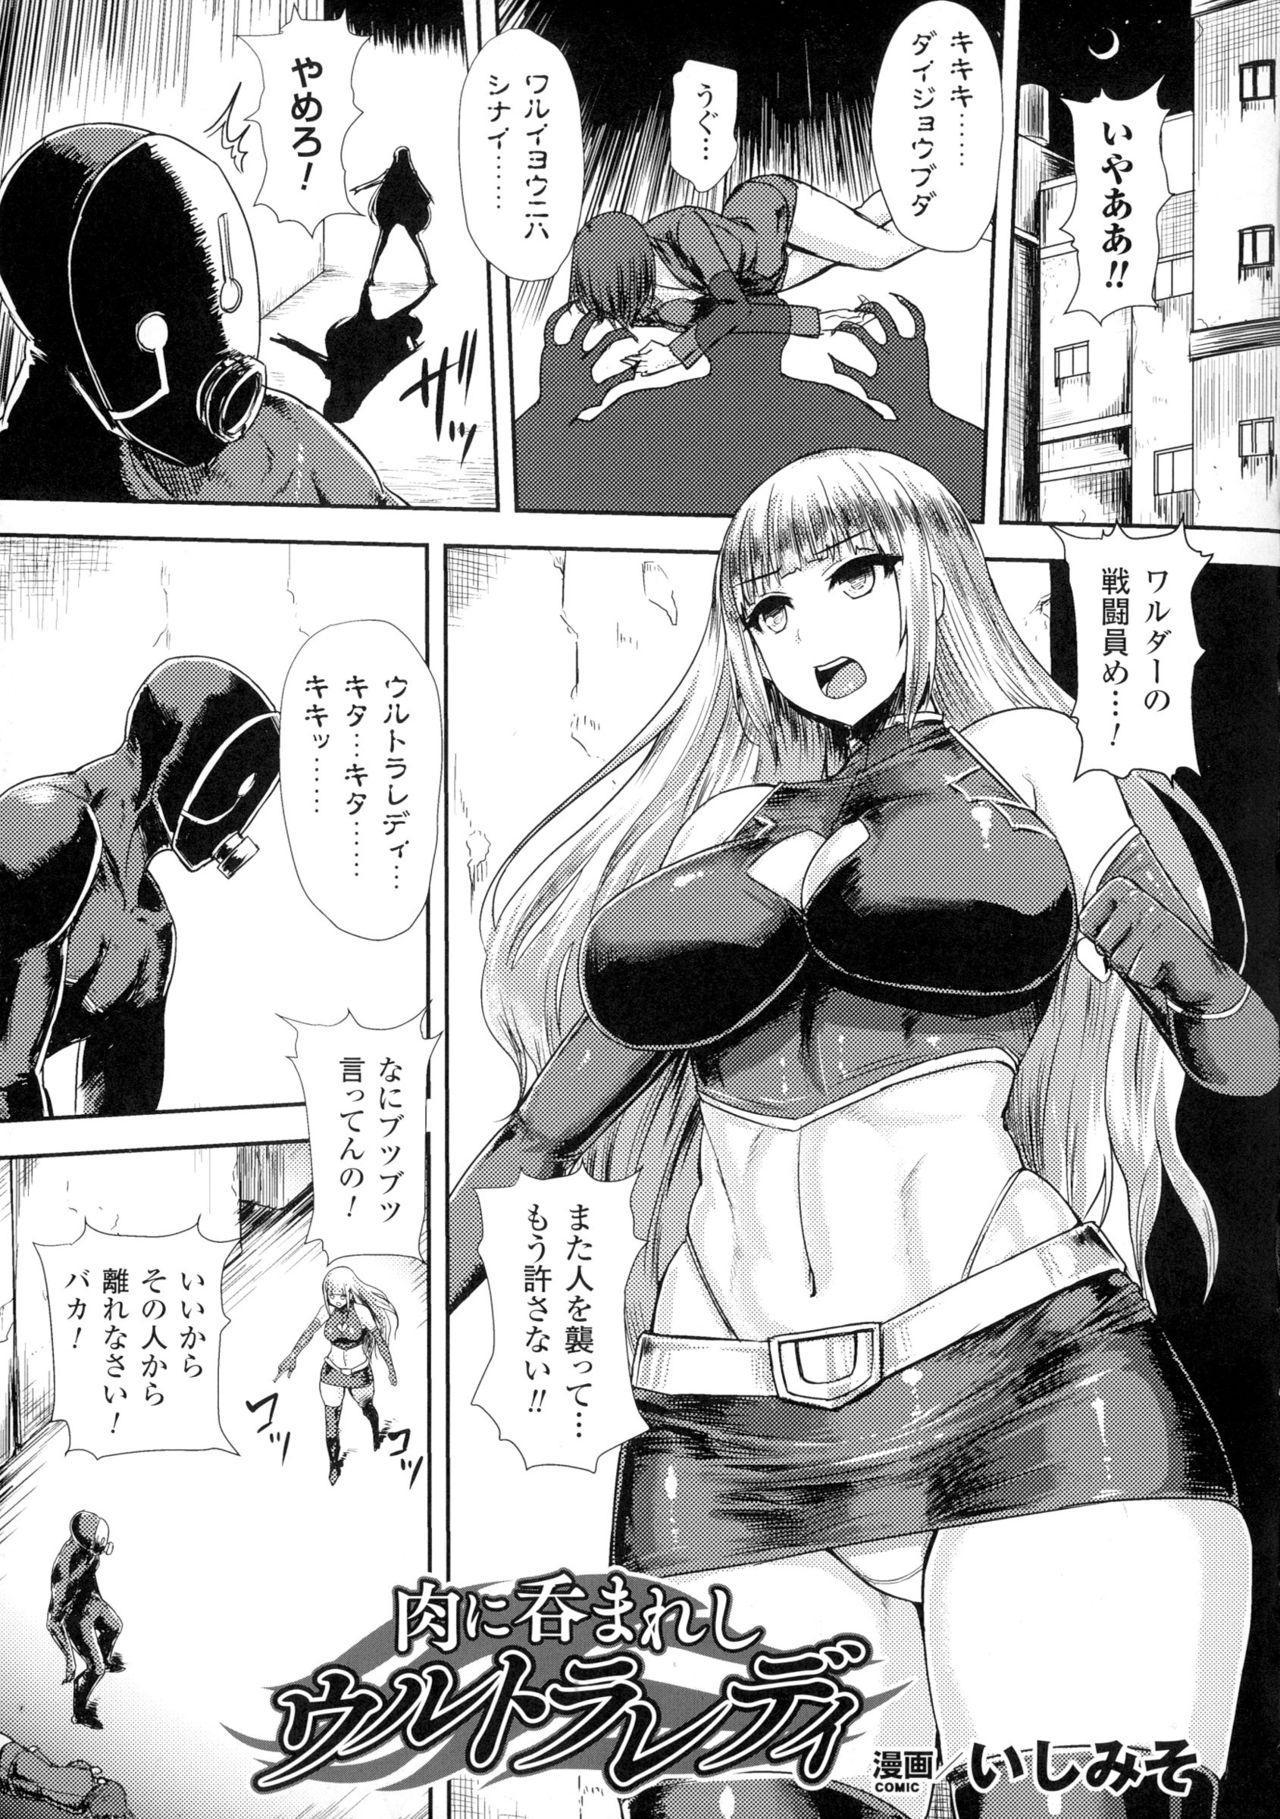 Seigi no Heroine Kangoku File DX Vol. 1 29